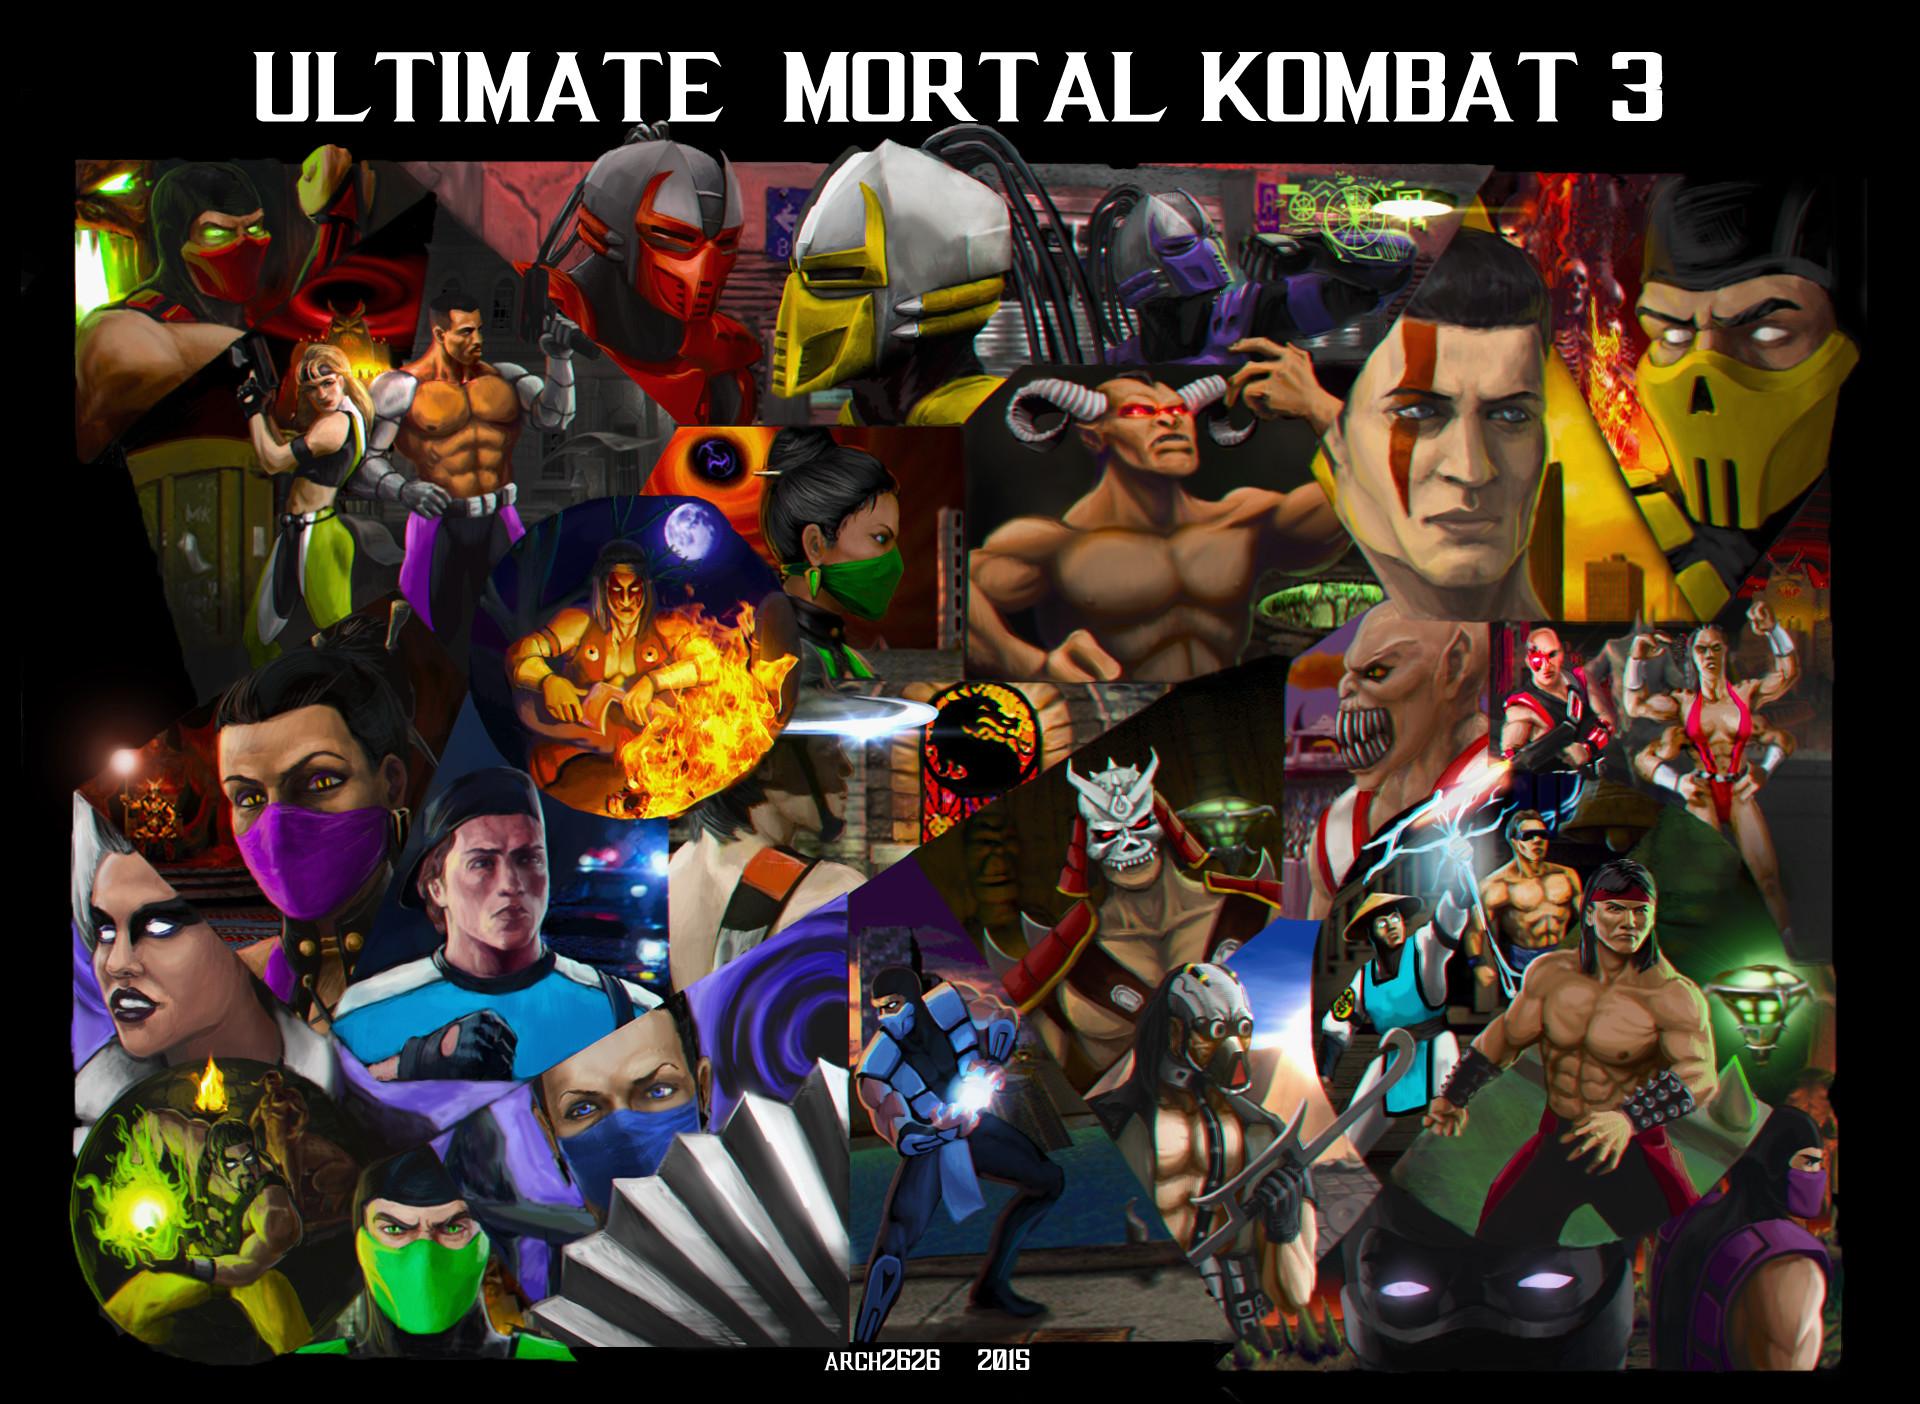 ArtStation - Ultimate Mortal Kombat 3, Eugene Napadovskiy